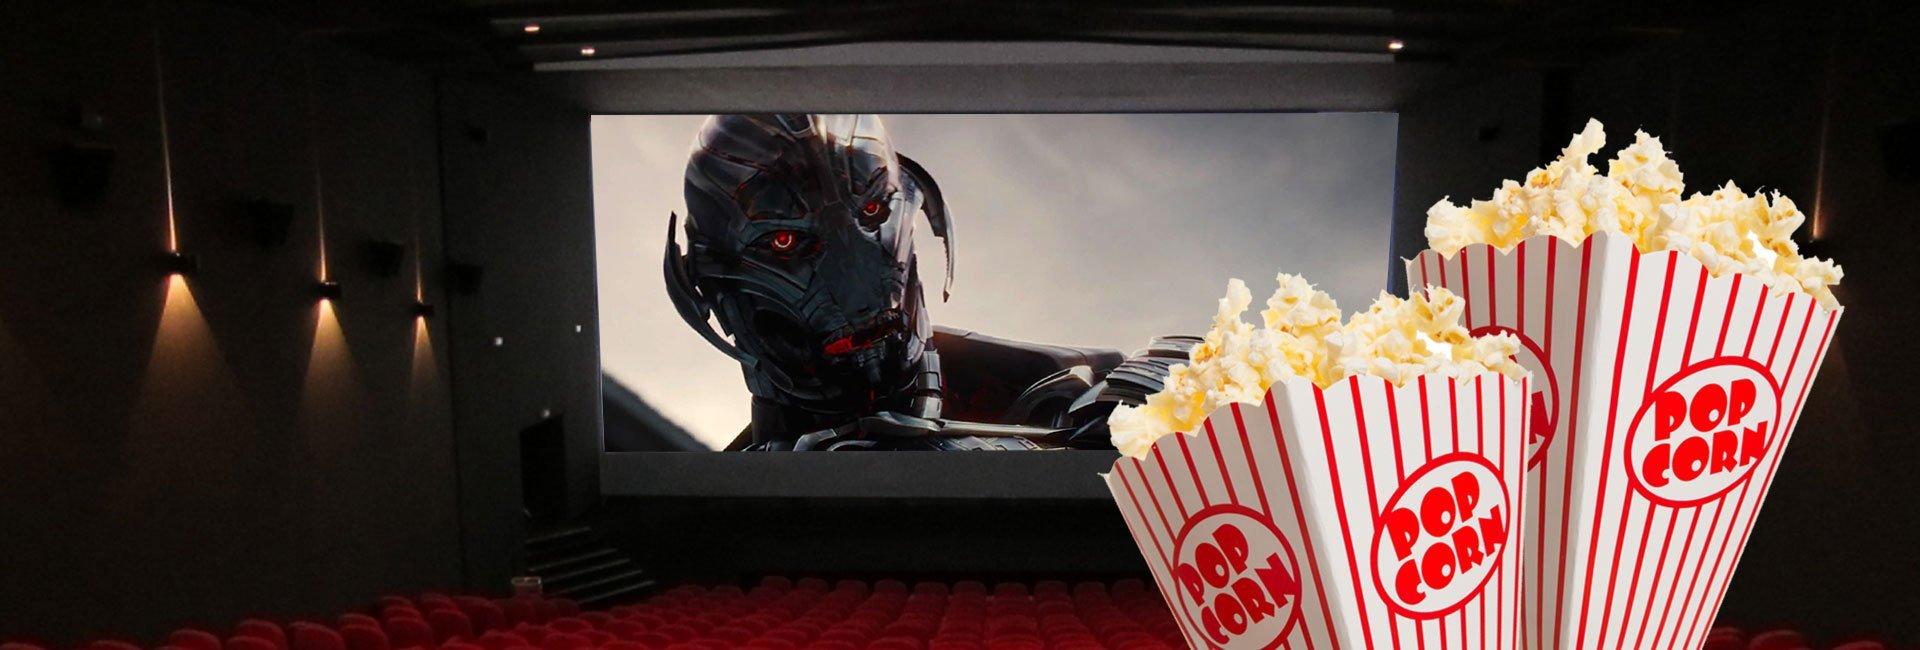 Top 11 Biggest Blockbuster Movies 2015